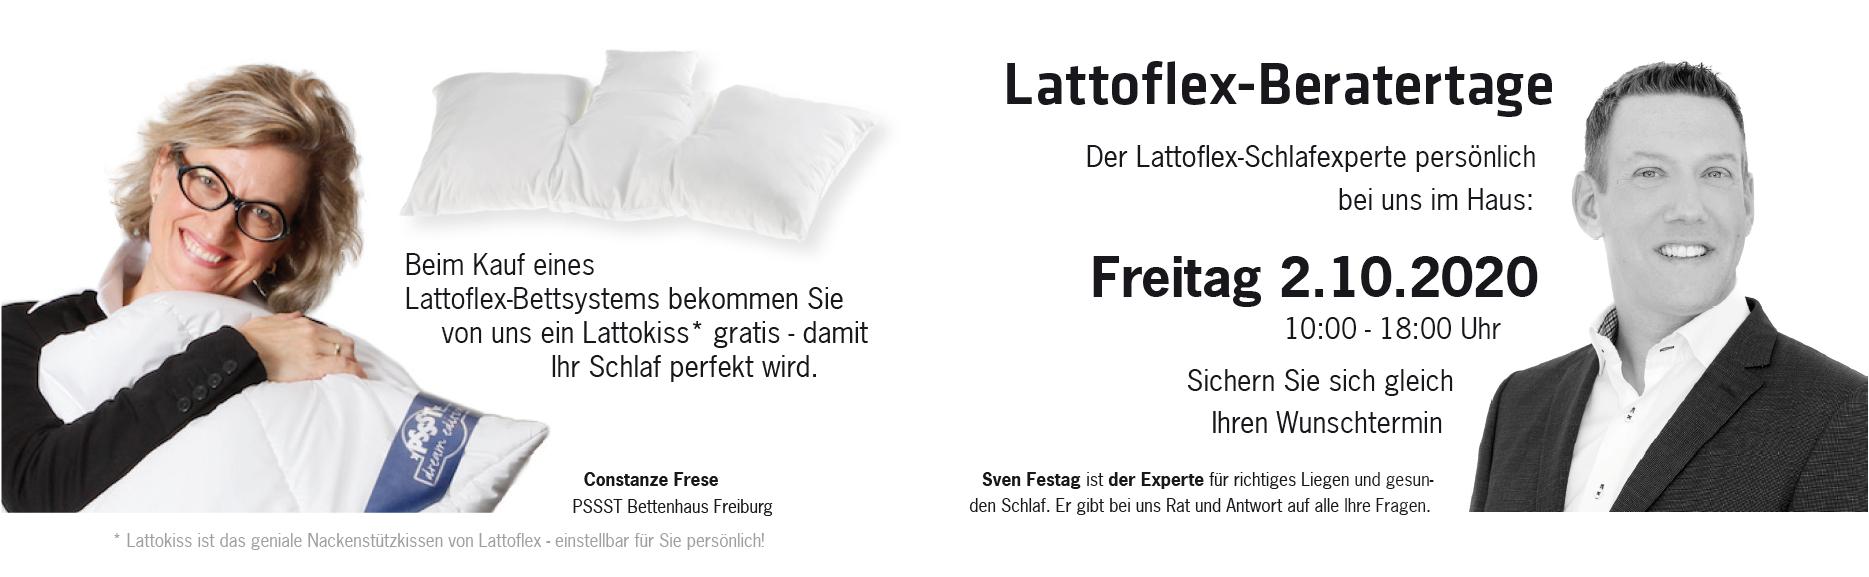 PSSST-Lattoflex-Beratertage Freitag 2.10.2020